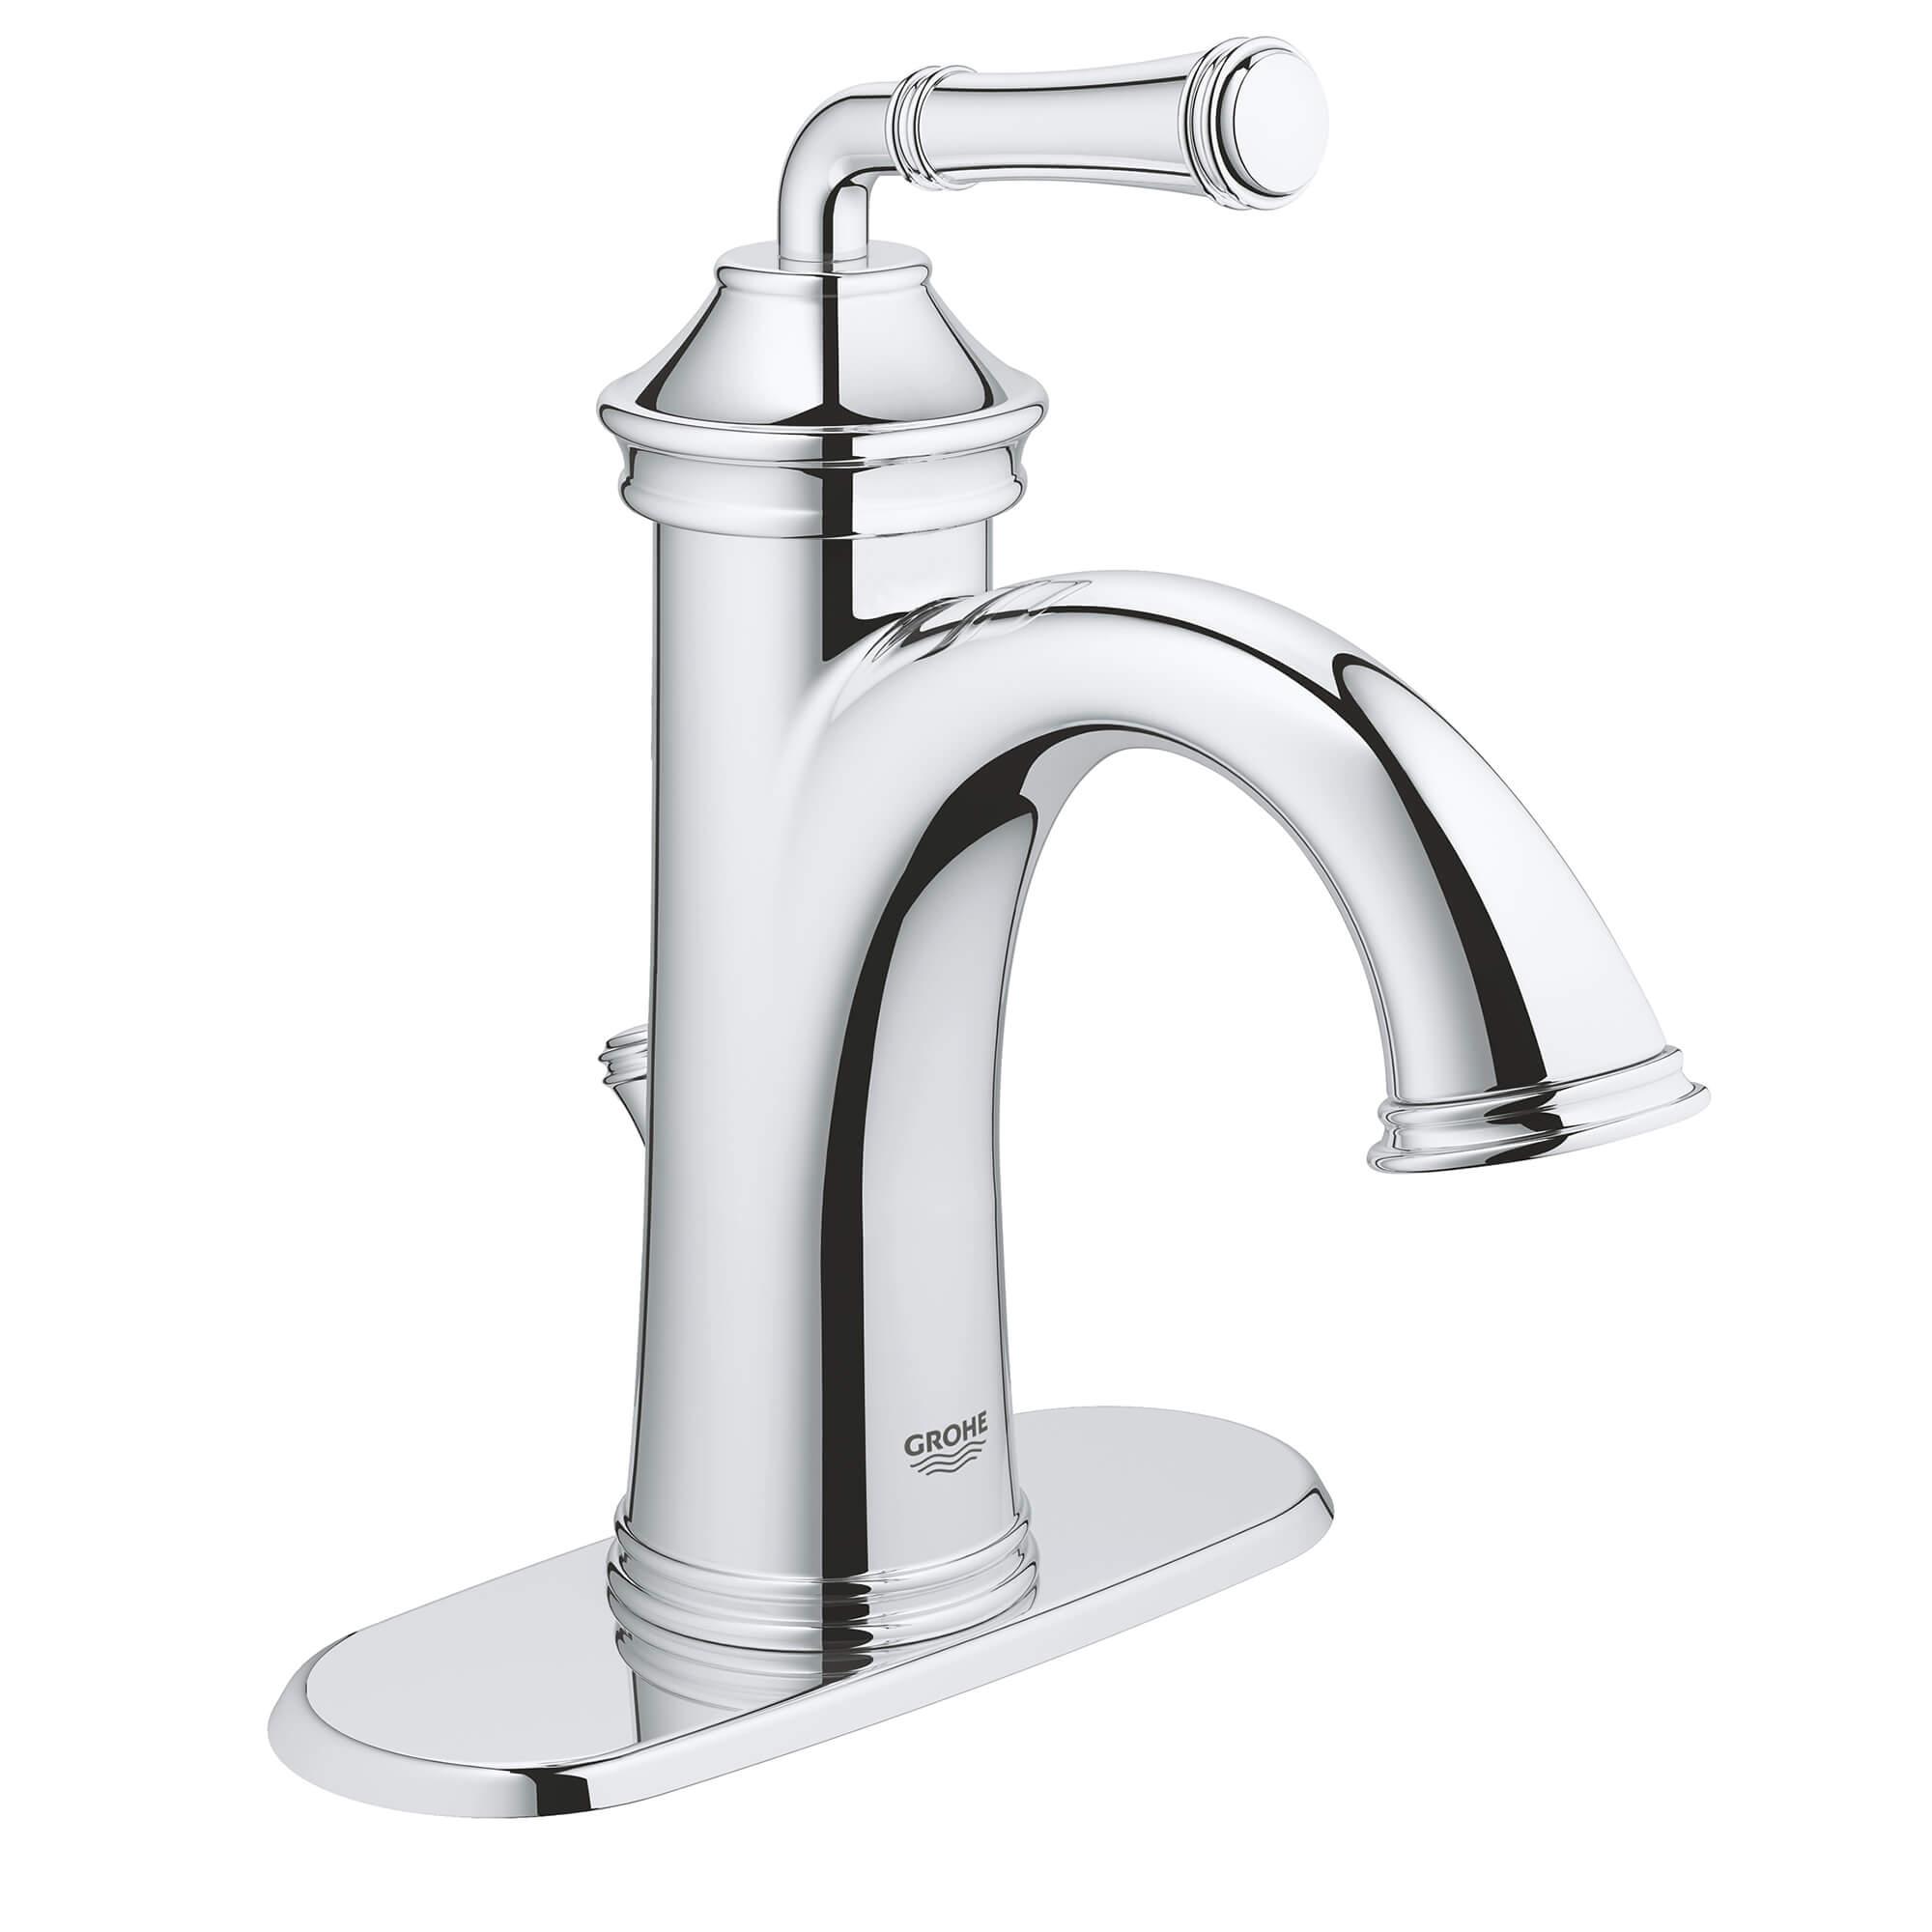 size bathroom faucet 4 5 l min 1 2 gpm